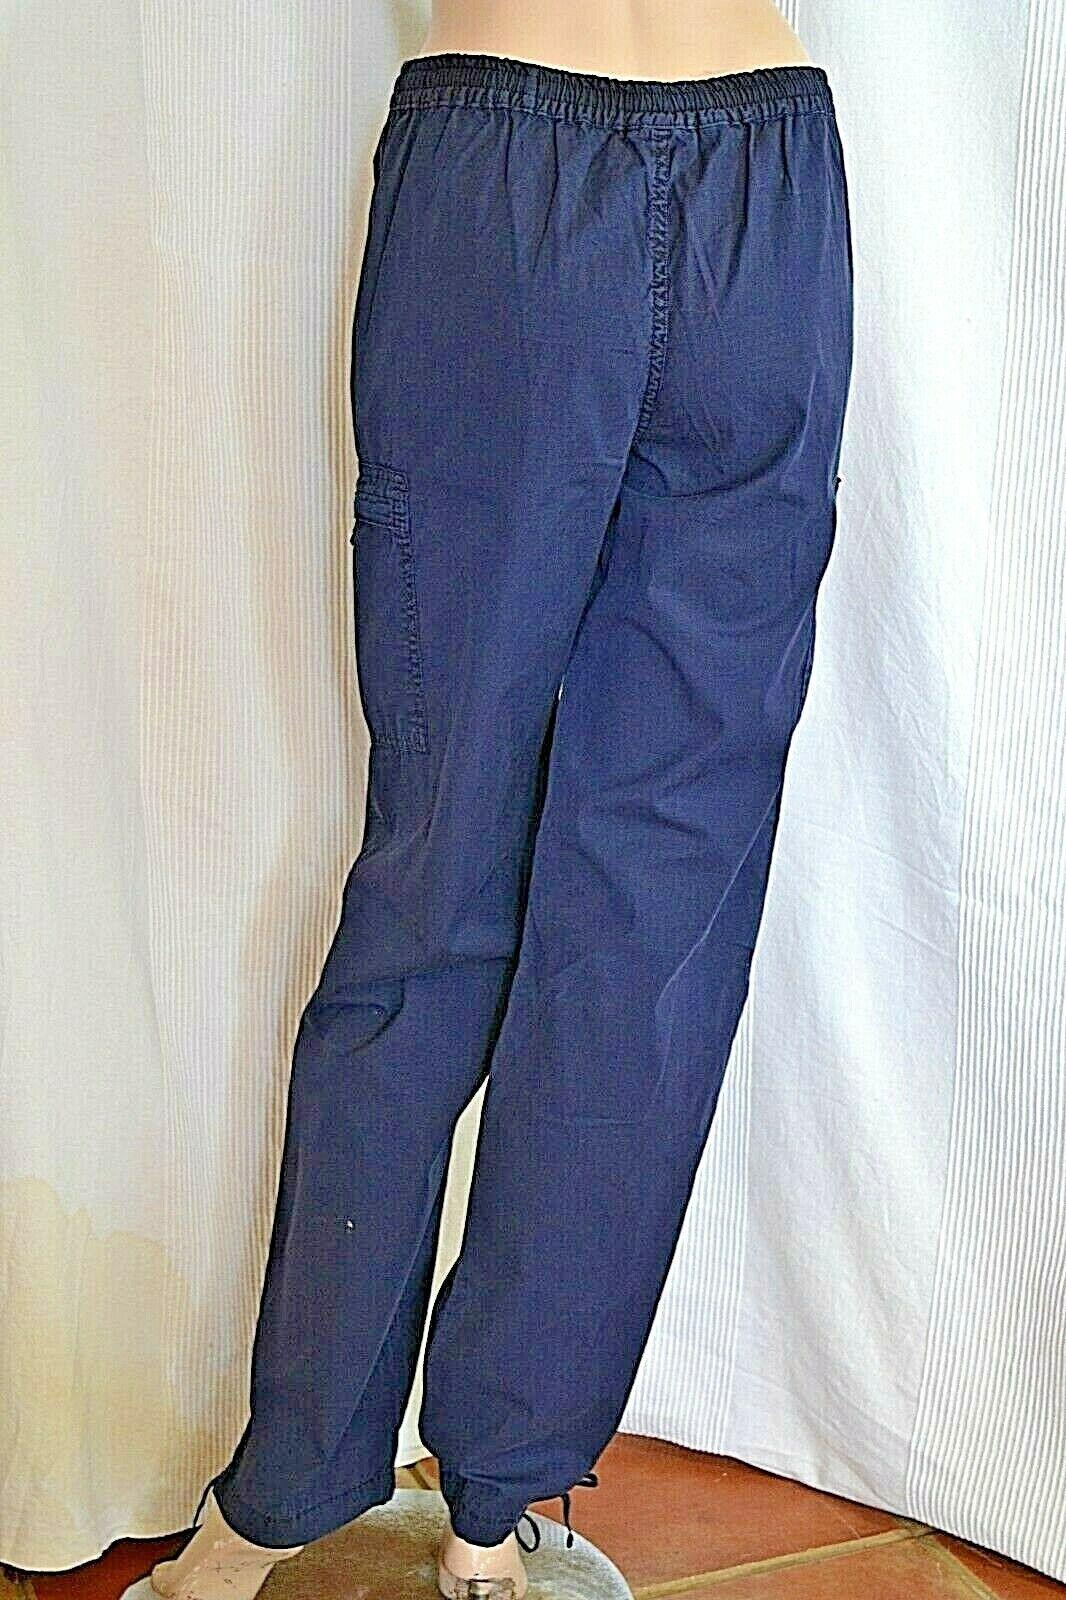 Murphy & Nye Hose trousers Blau W29   38 M neu  NEW jogging style blau